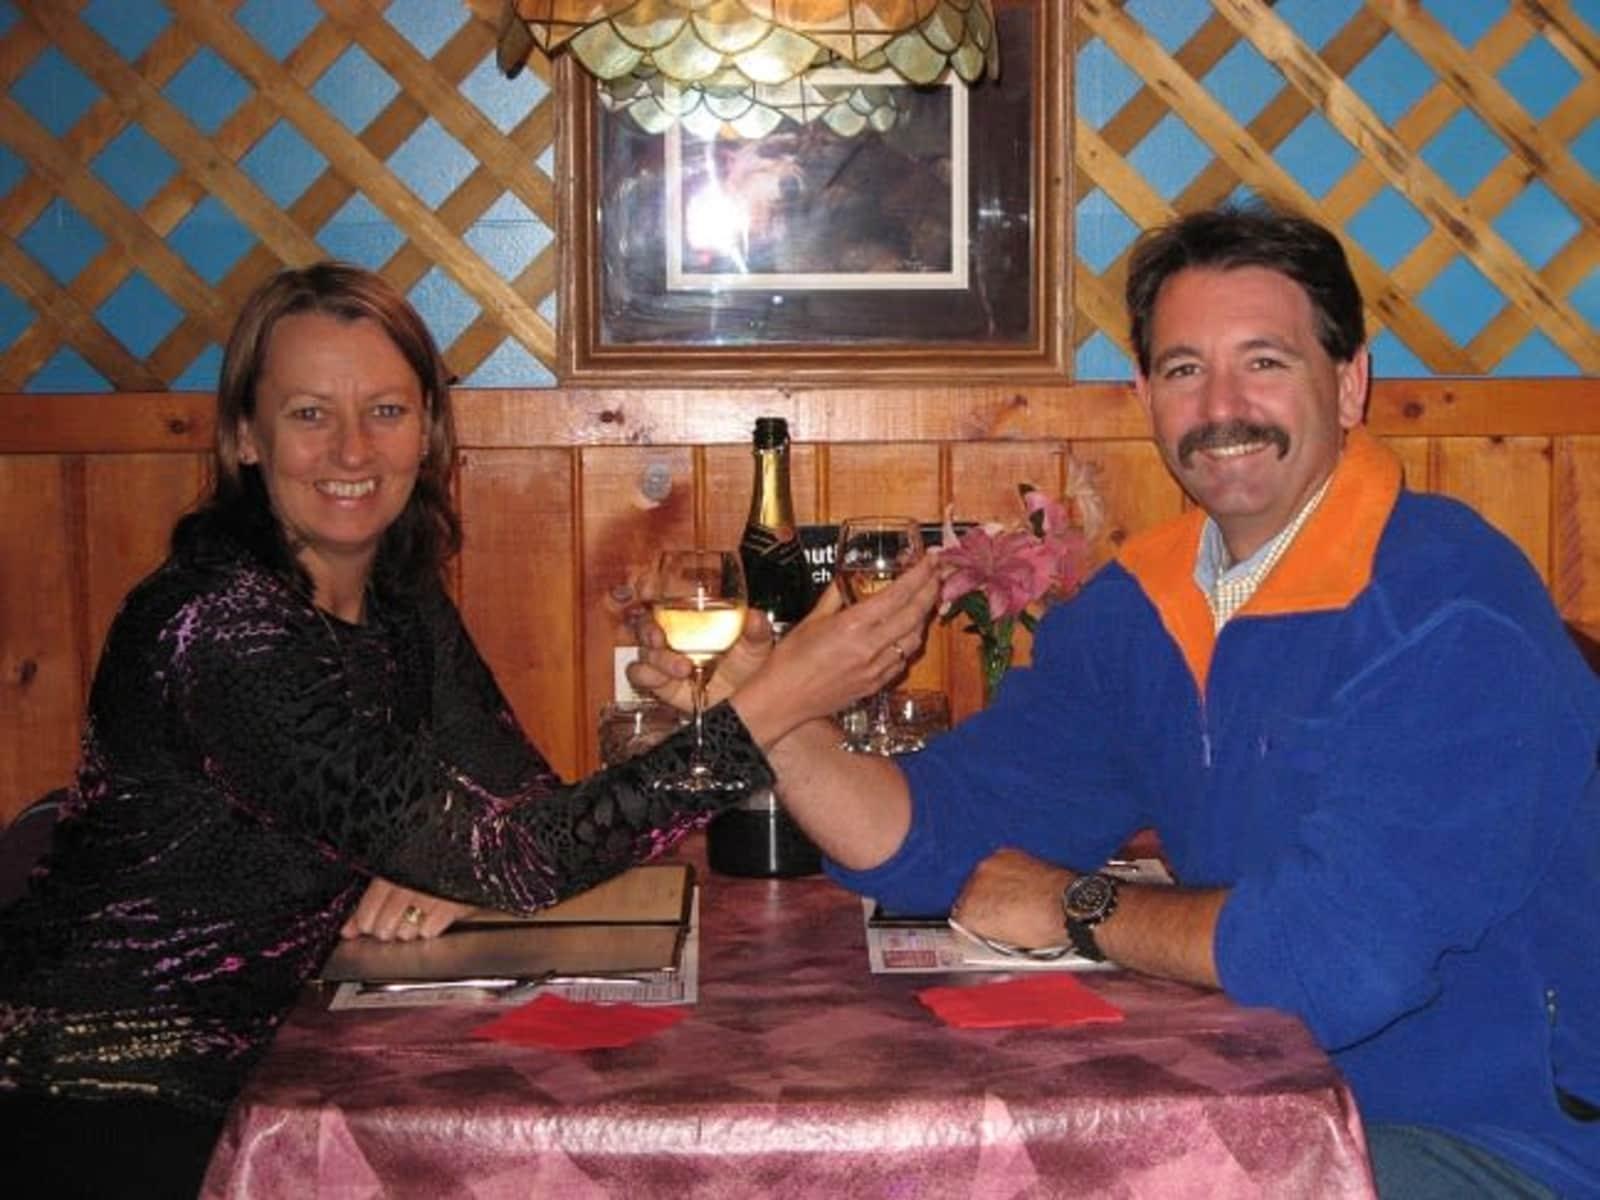 Shane & Judy from Geelong, Victoria, Australia